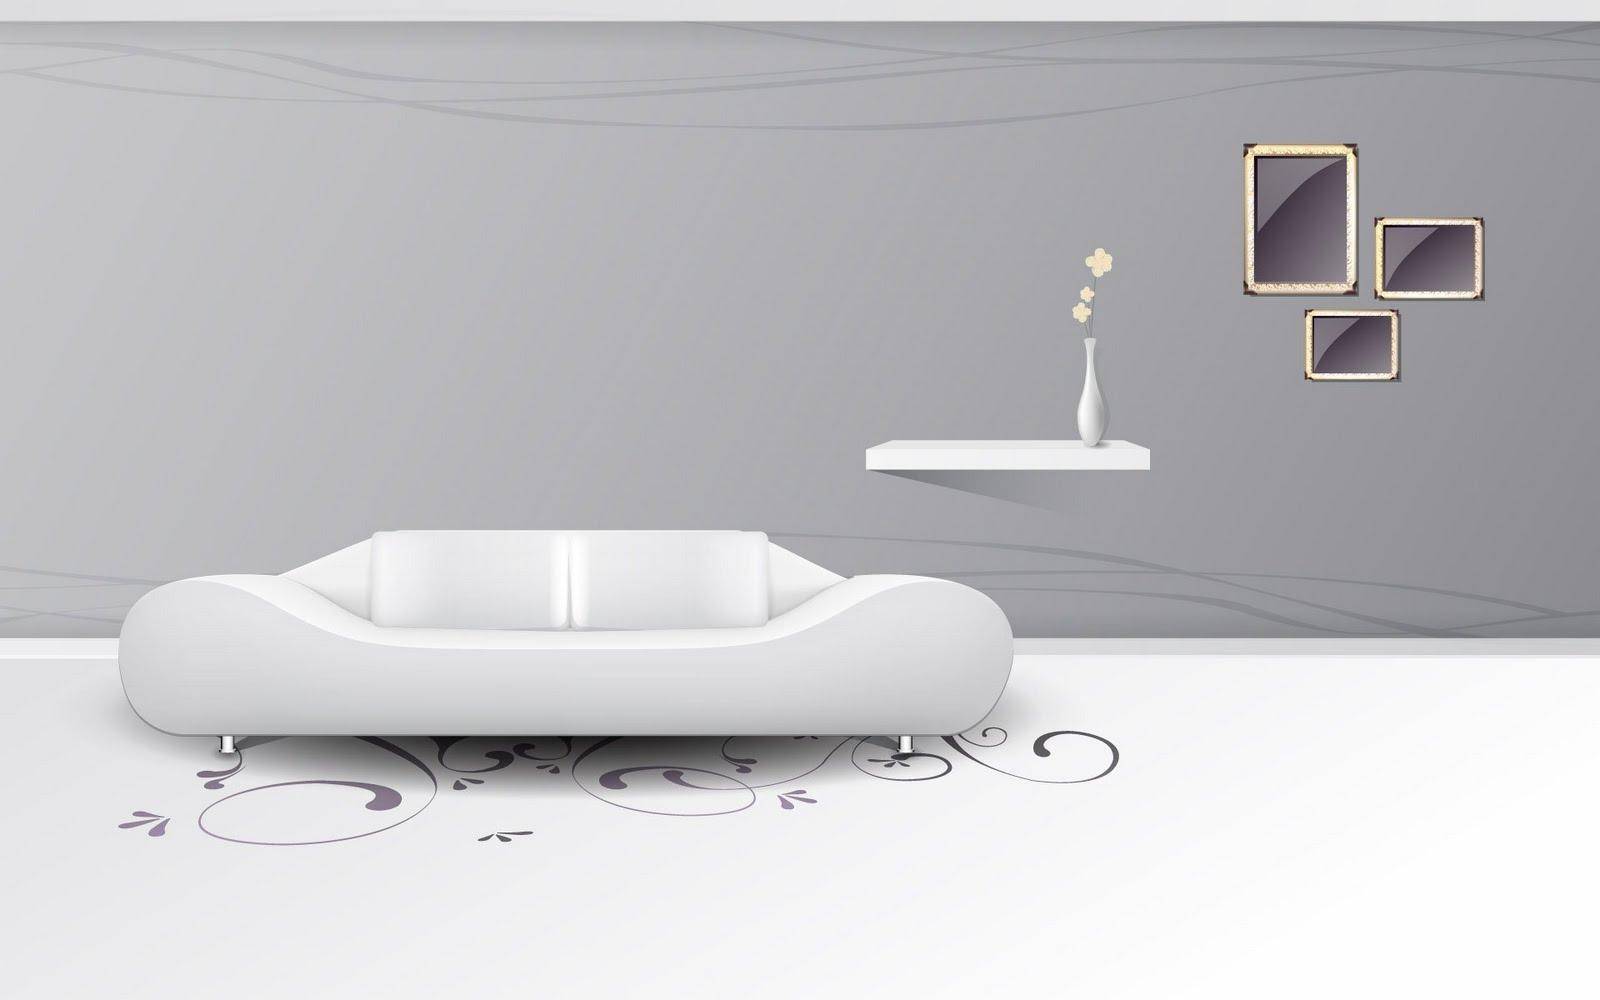 Digital Art Interior Design HD Wallpaper Set 2